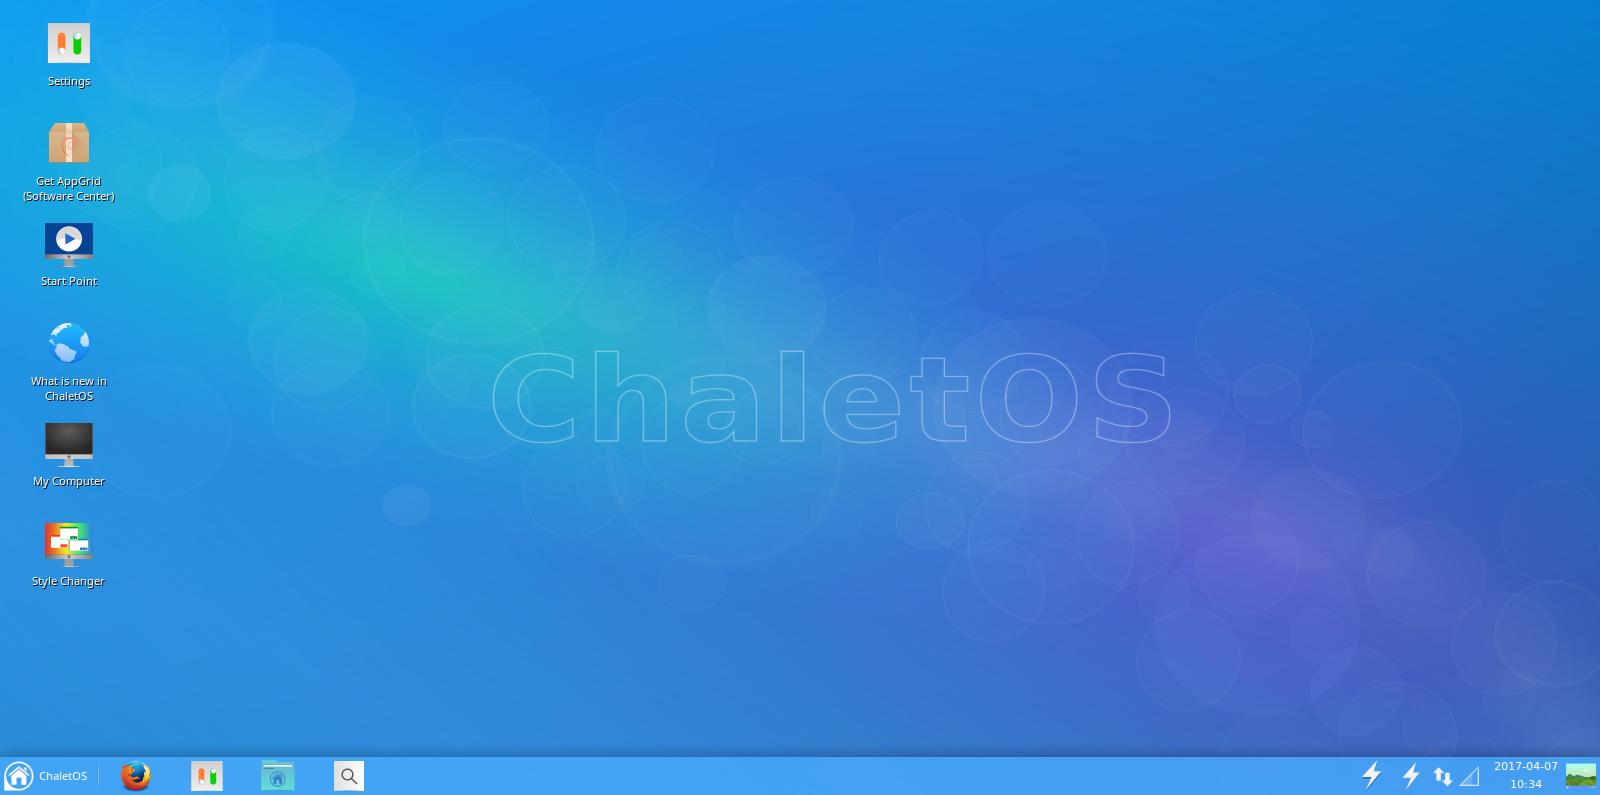 chaletos 16.04.2 desktop.png